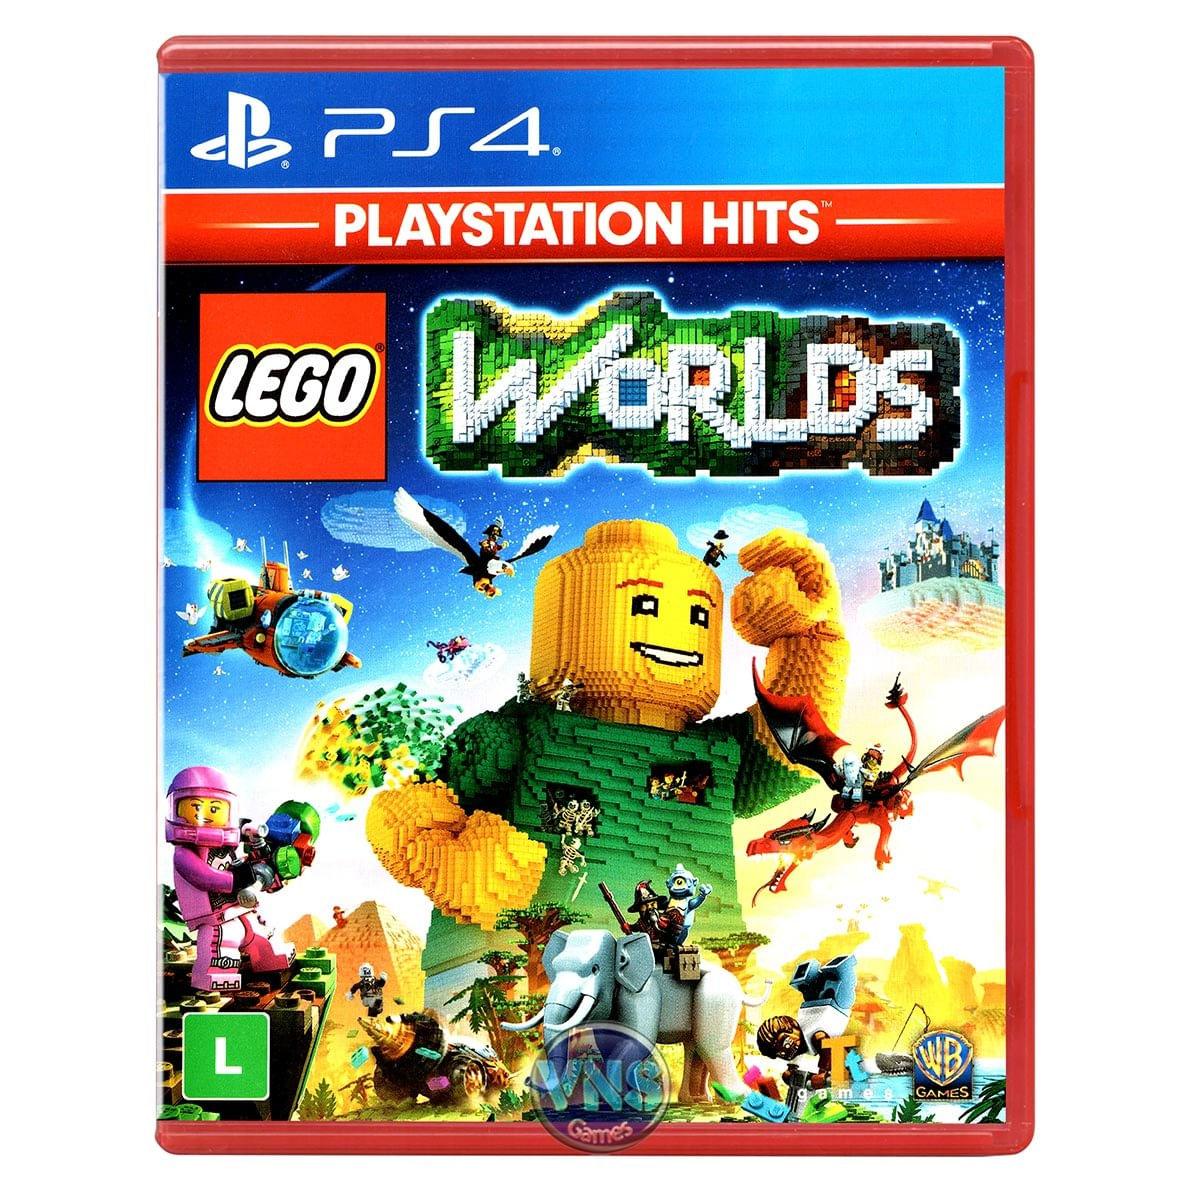 Jogo Lego Worlds Hits - Playstation 4 - Warner Bros Interactive Entertainment